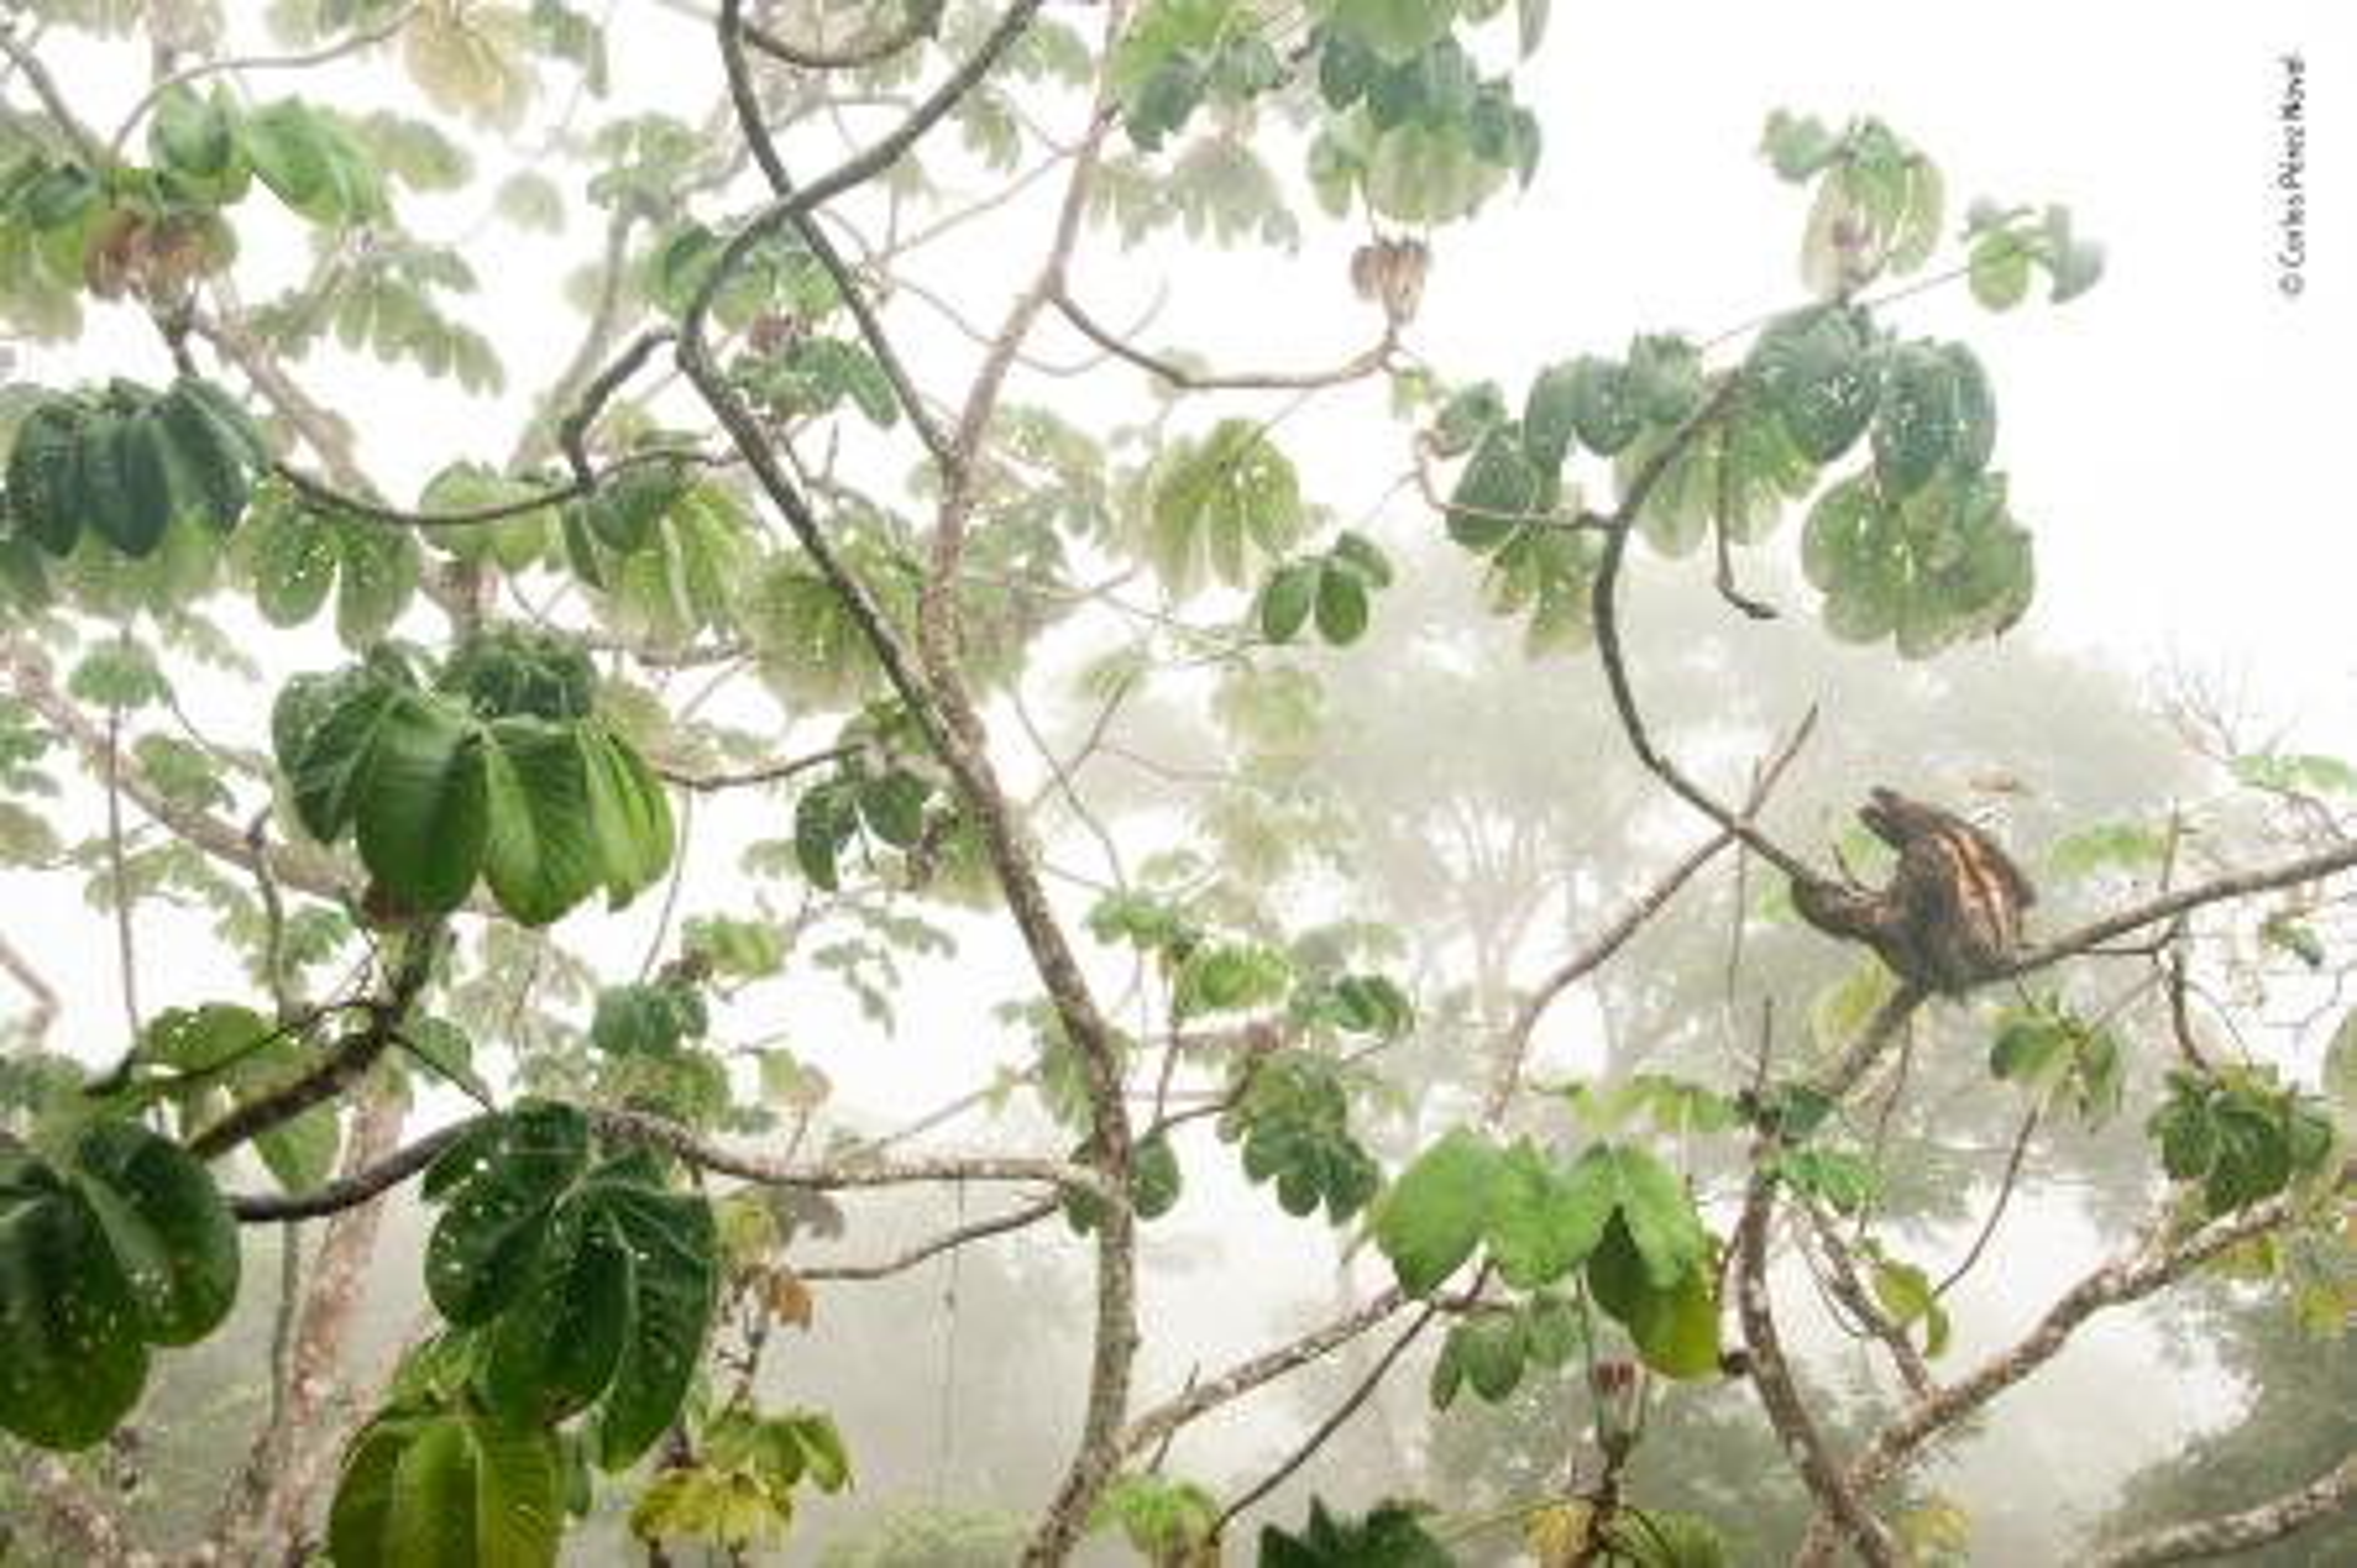 © Carlos Perez Naval - Wildlife Photographer of the Year